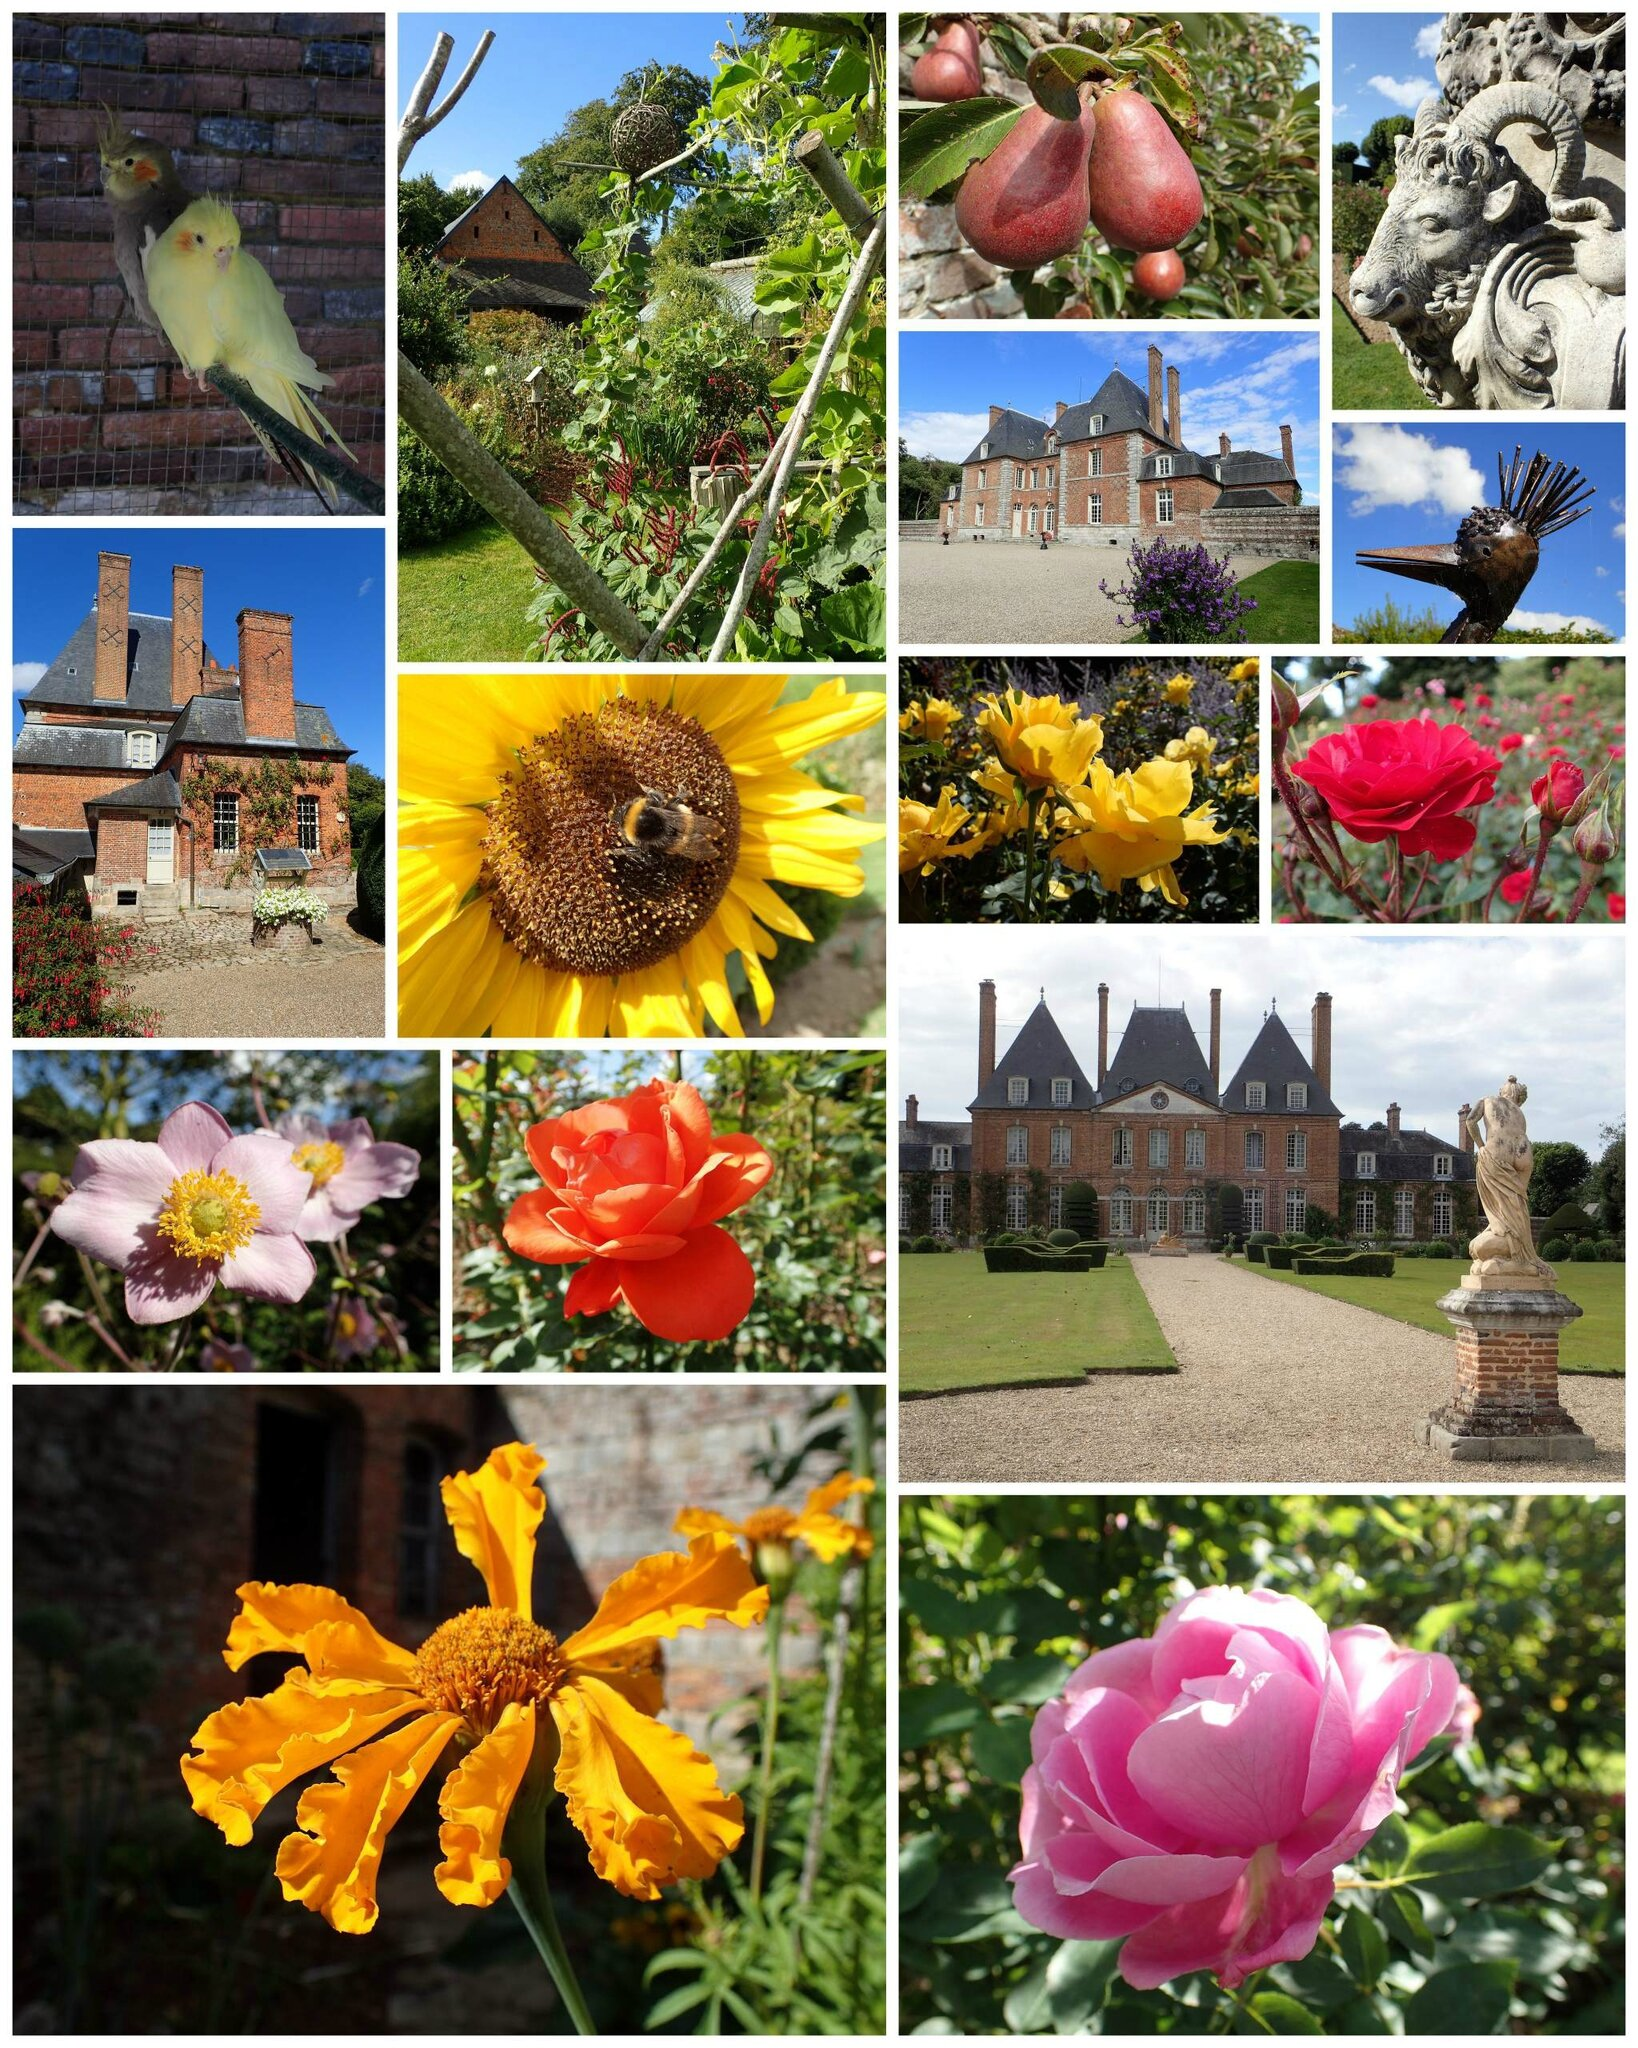 08_20 jardins Mesnil Geoffroy_sml